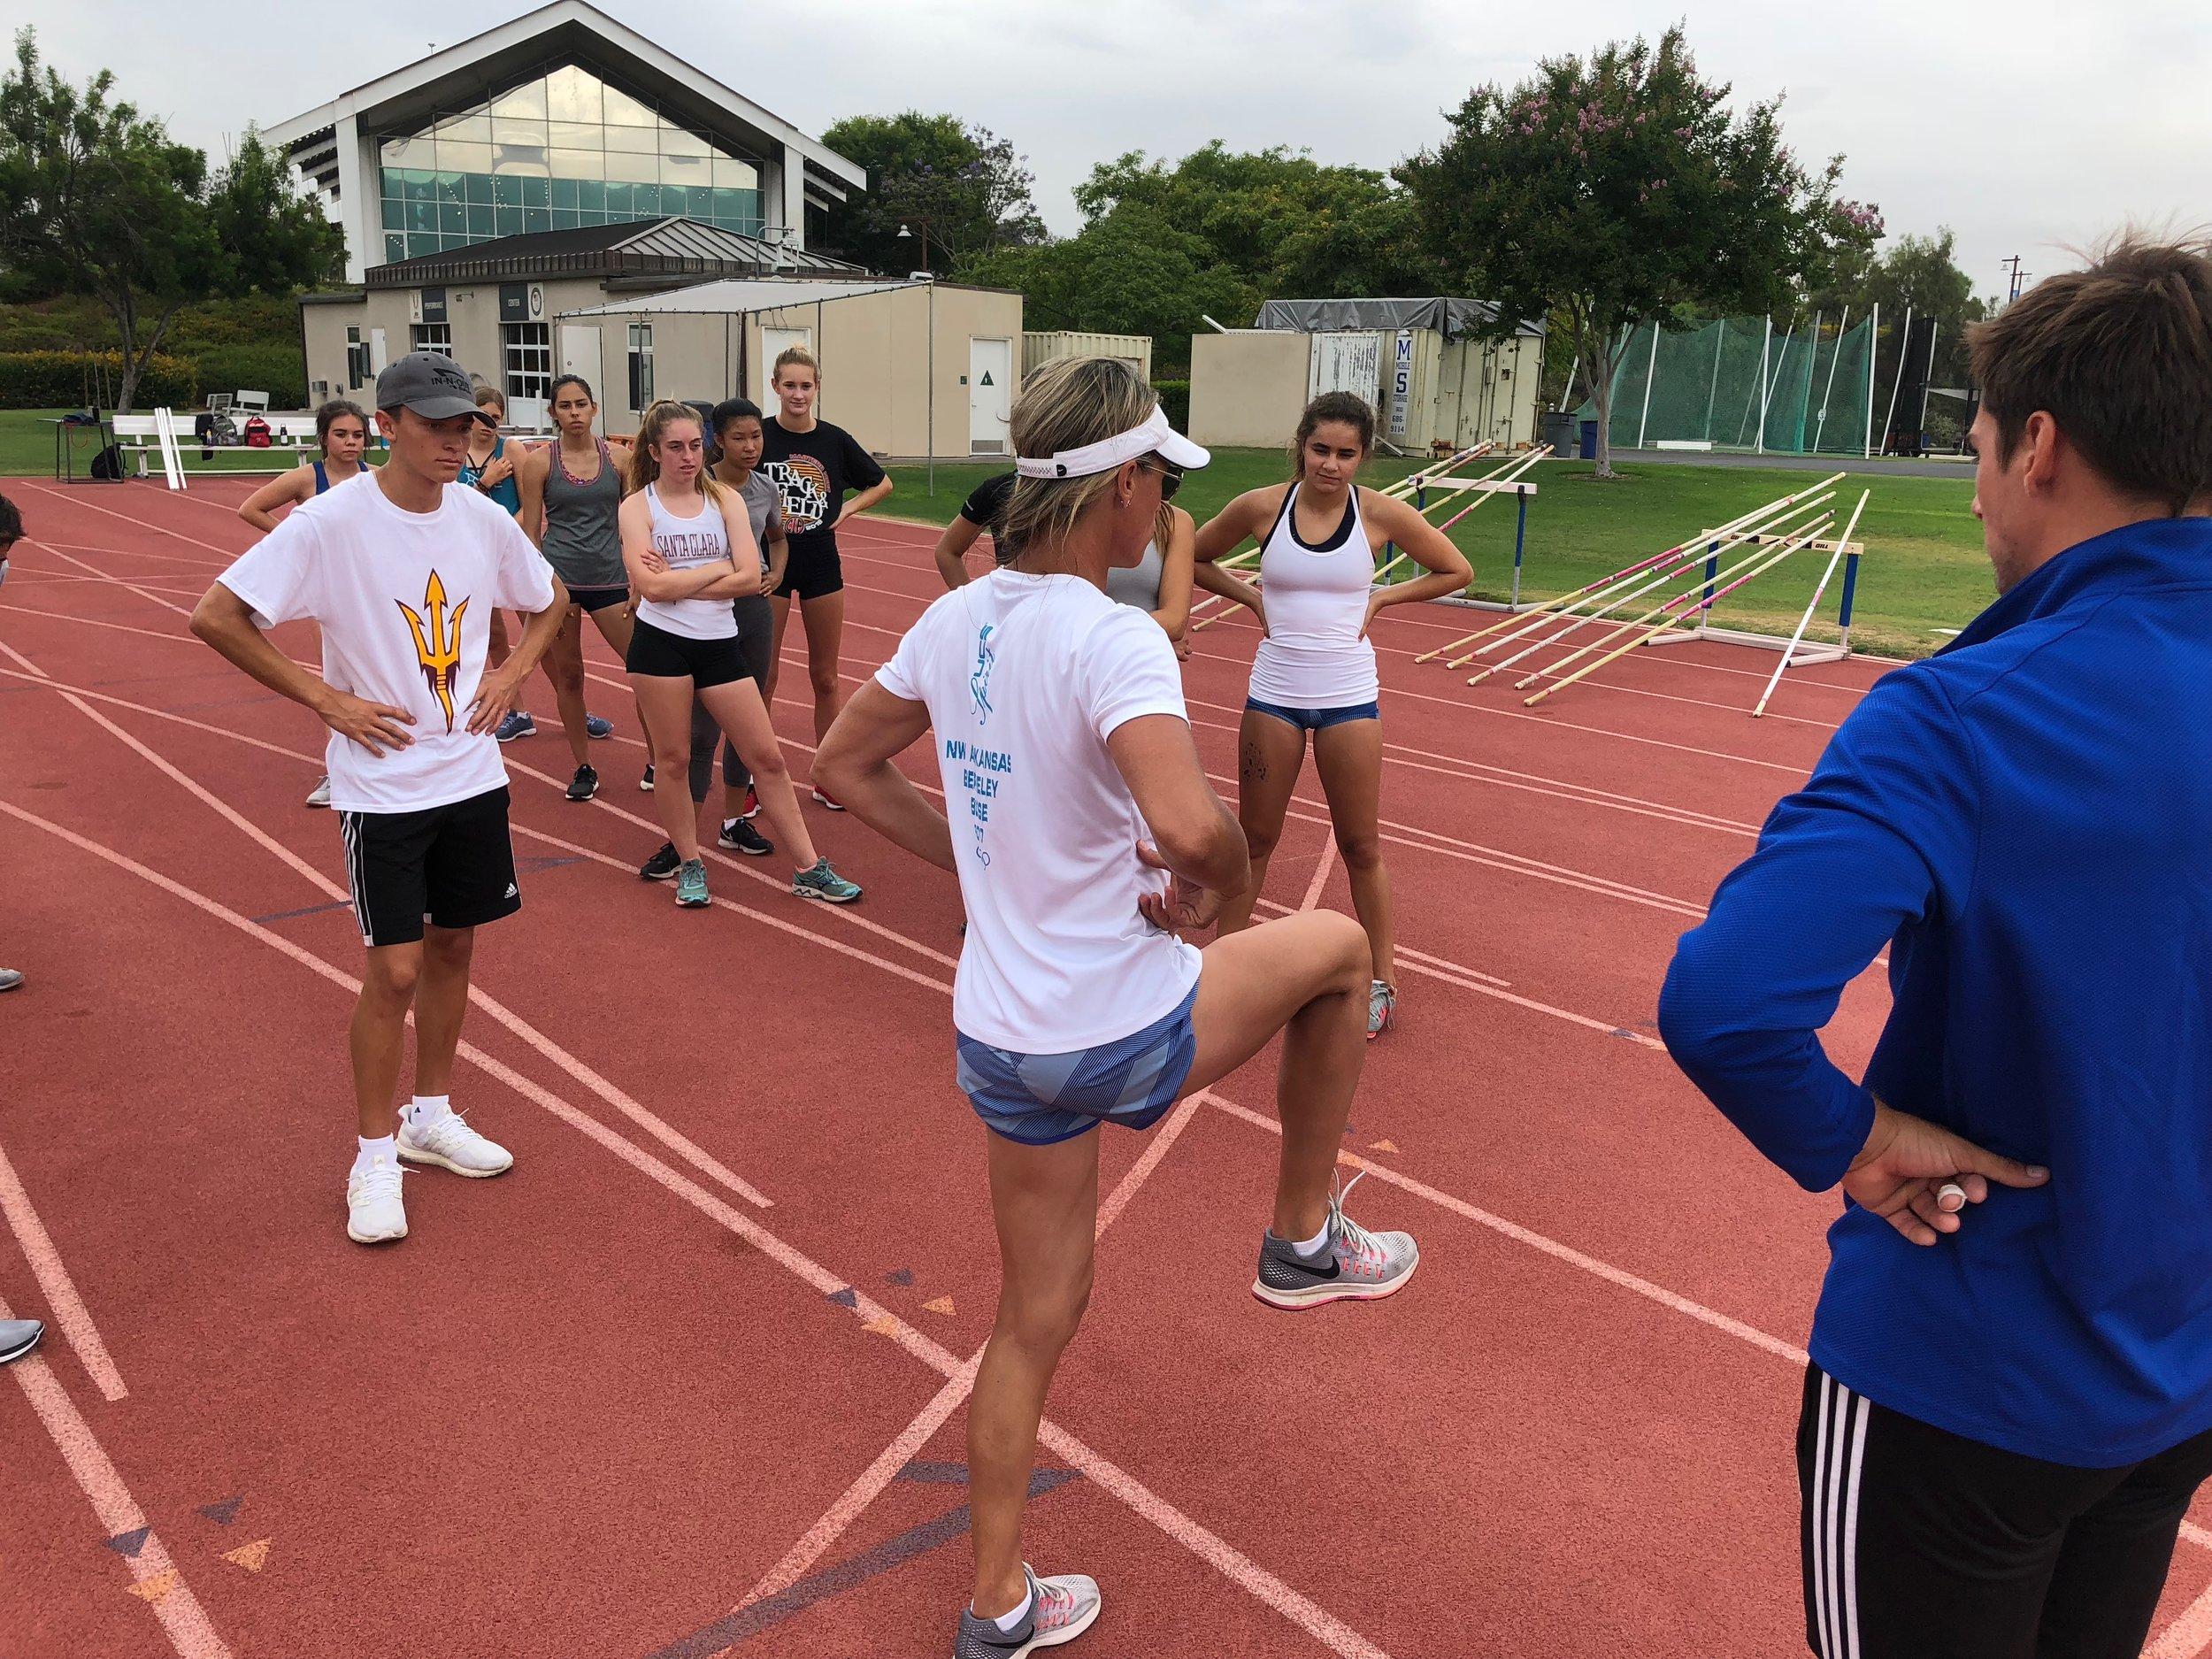 Coaching Image Stacy OTC 2018.JPG